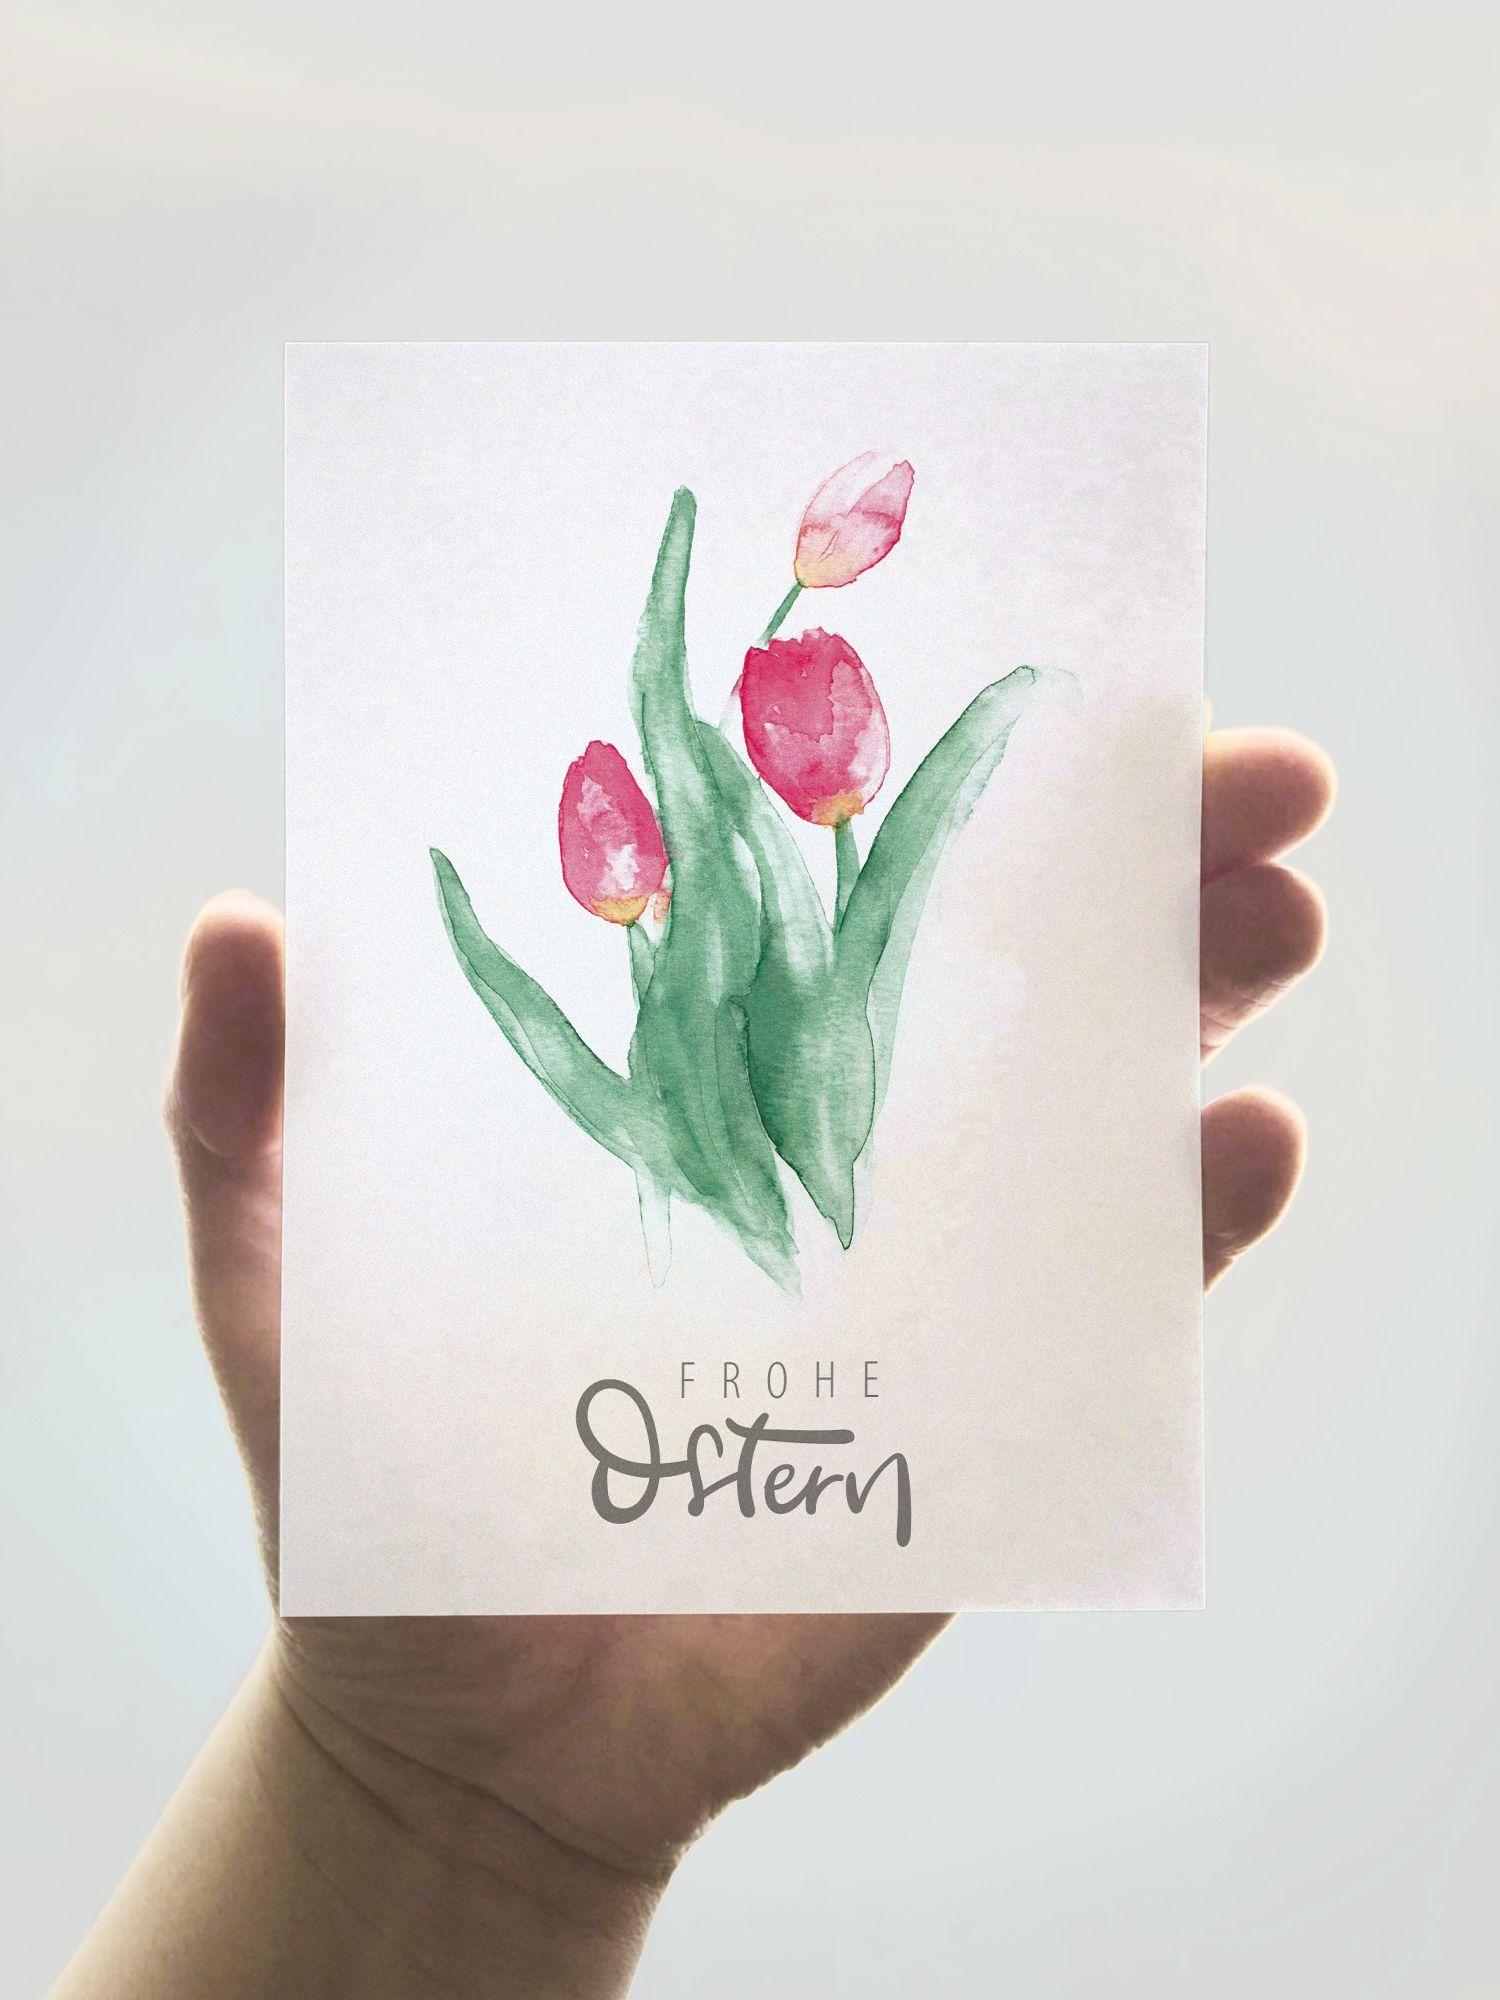 A6 Klappkarte Frohe Ostern Mit Tulpen Illustration Und Handlett